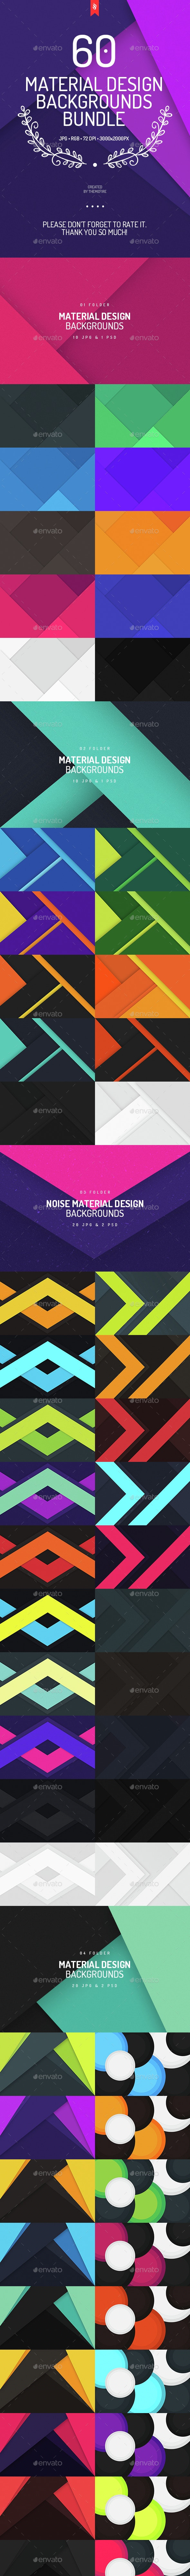 60 Material Design Backgrounds Bundle - Backgrounds Graphics